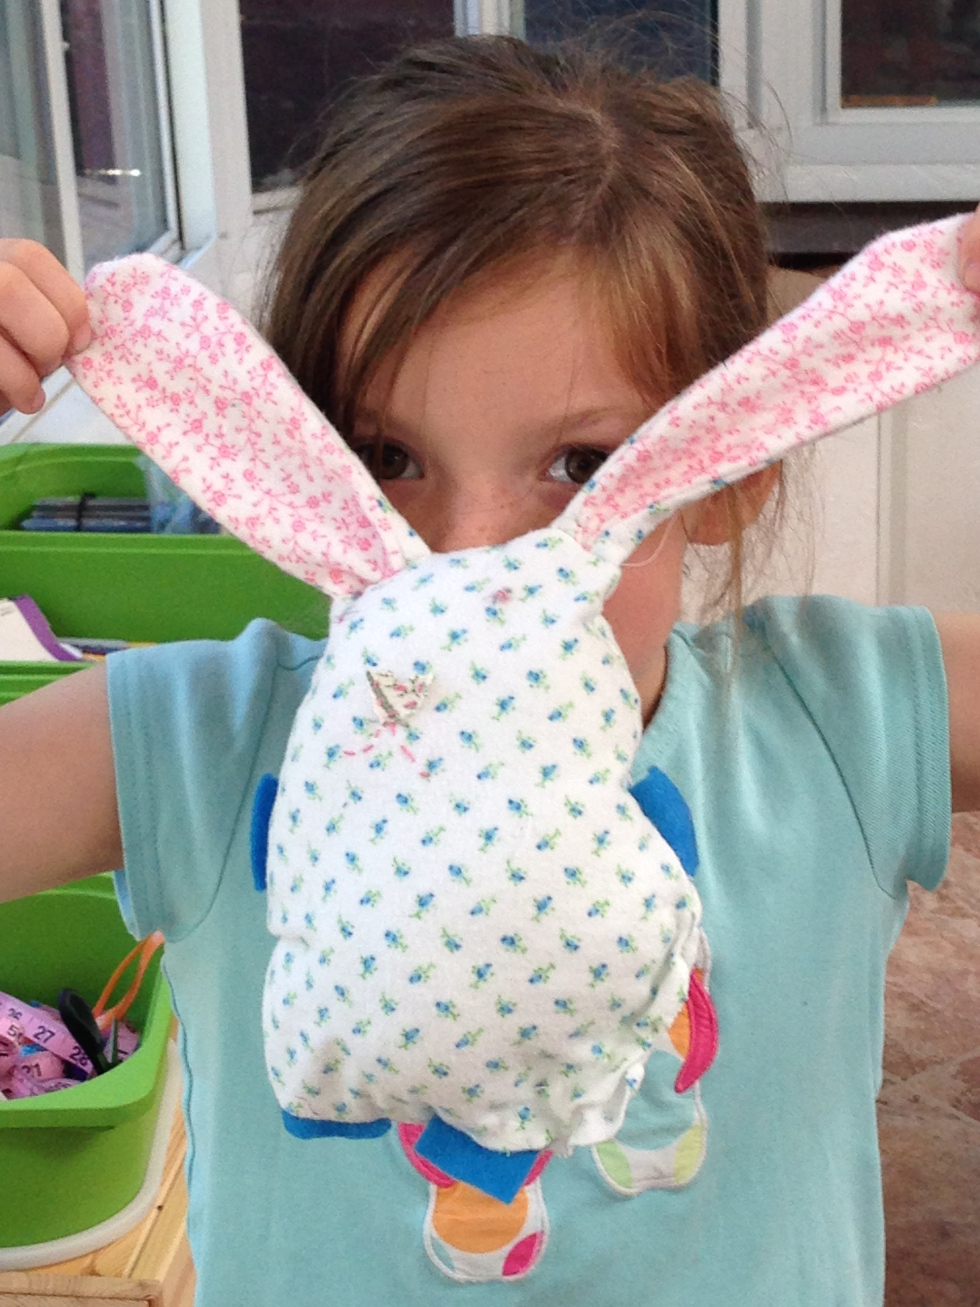 1st grader bunny pillow